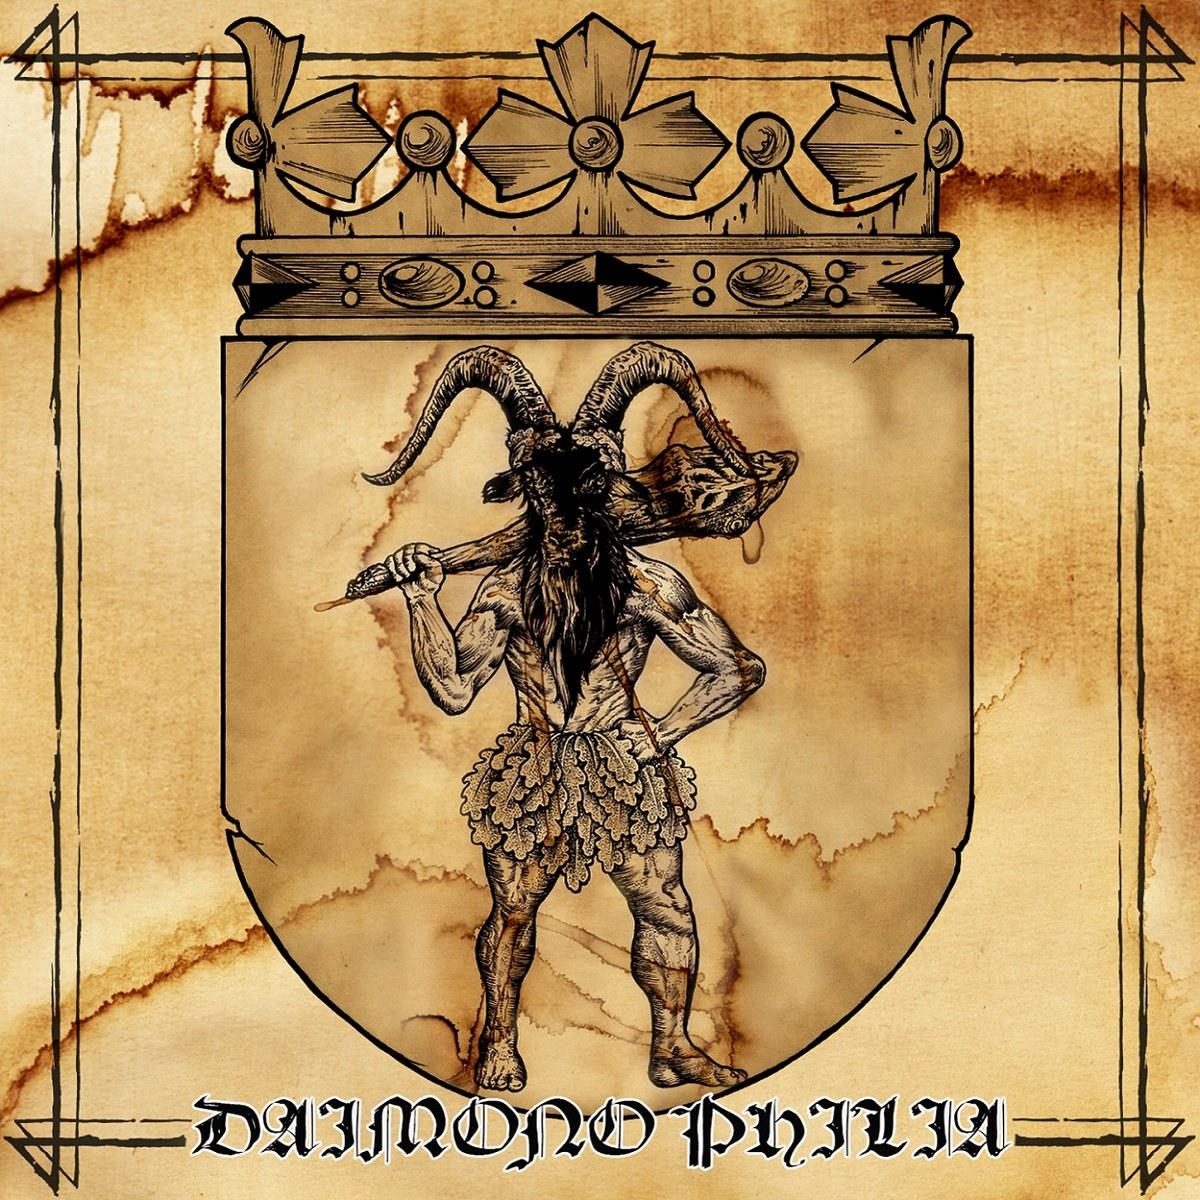 Reviews for Lord of Pagathorn - Daimono Philia